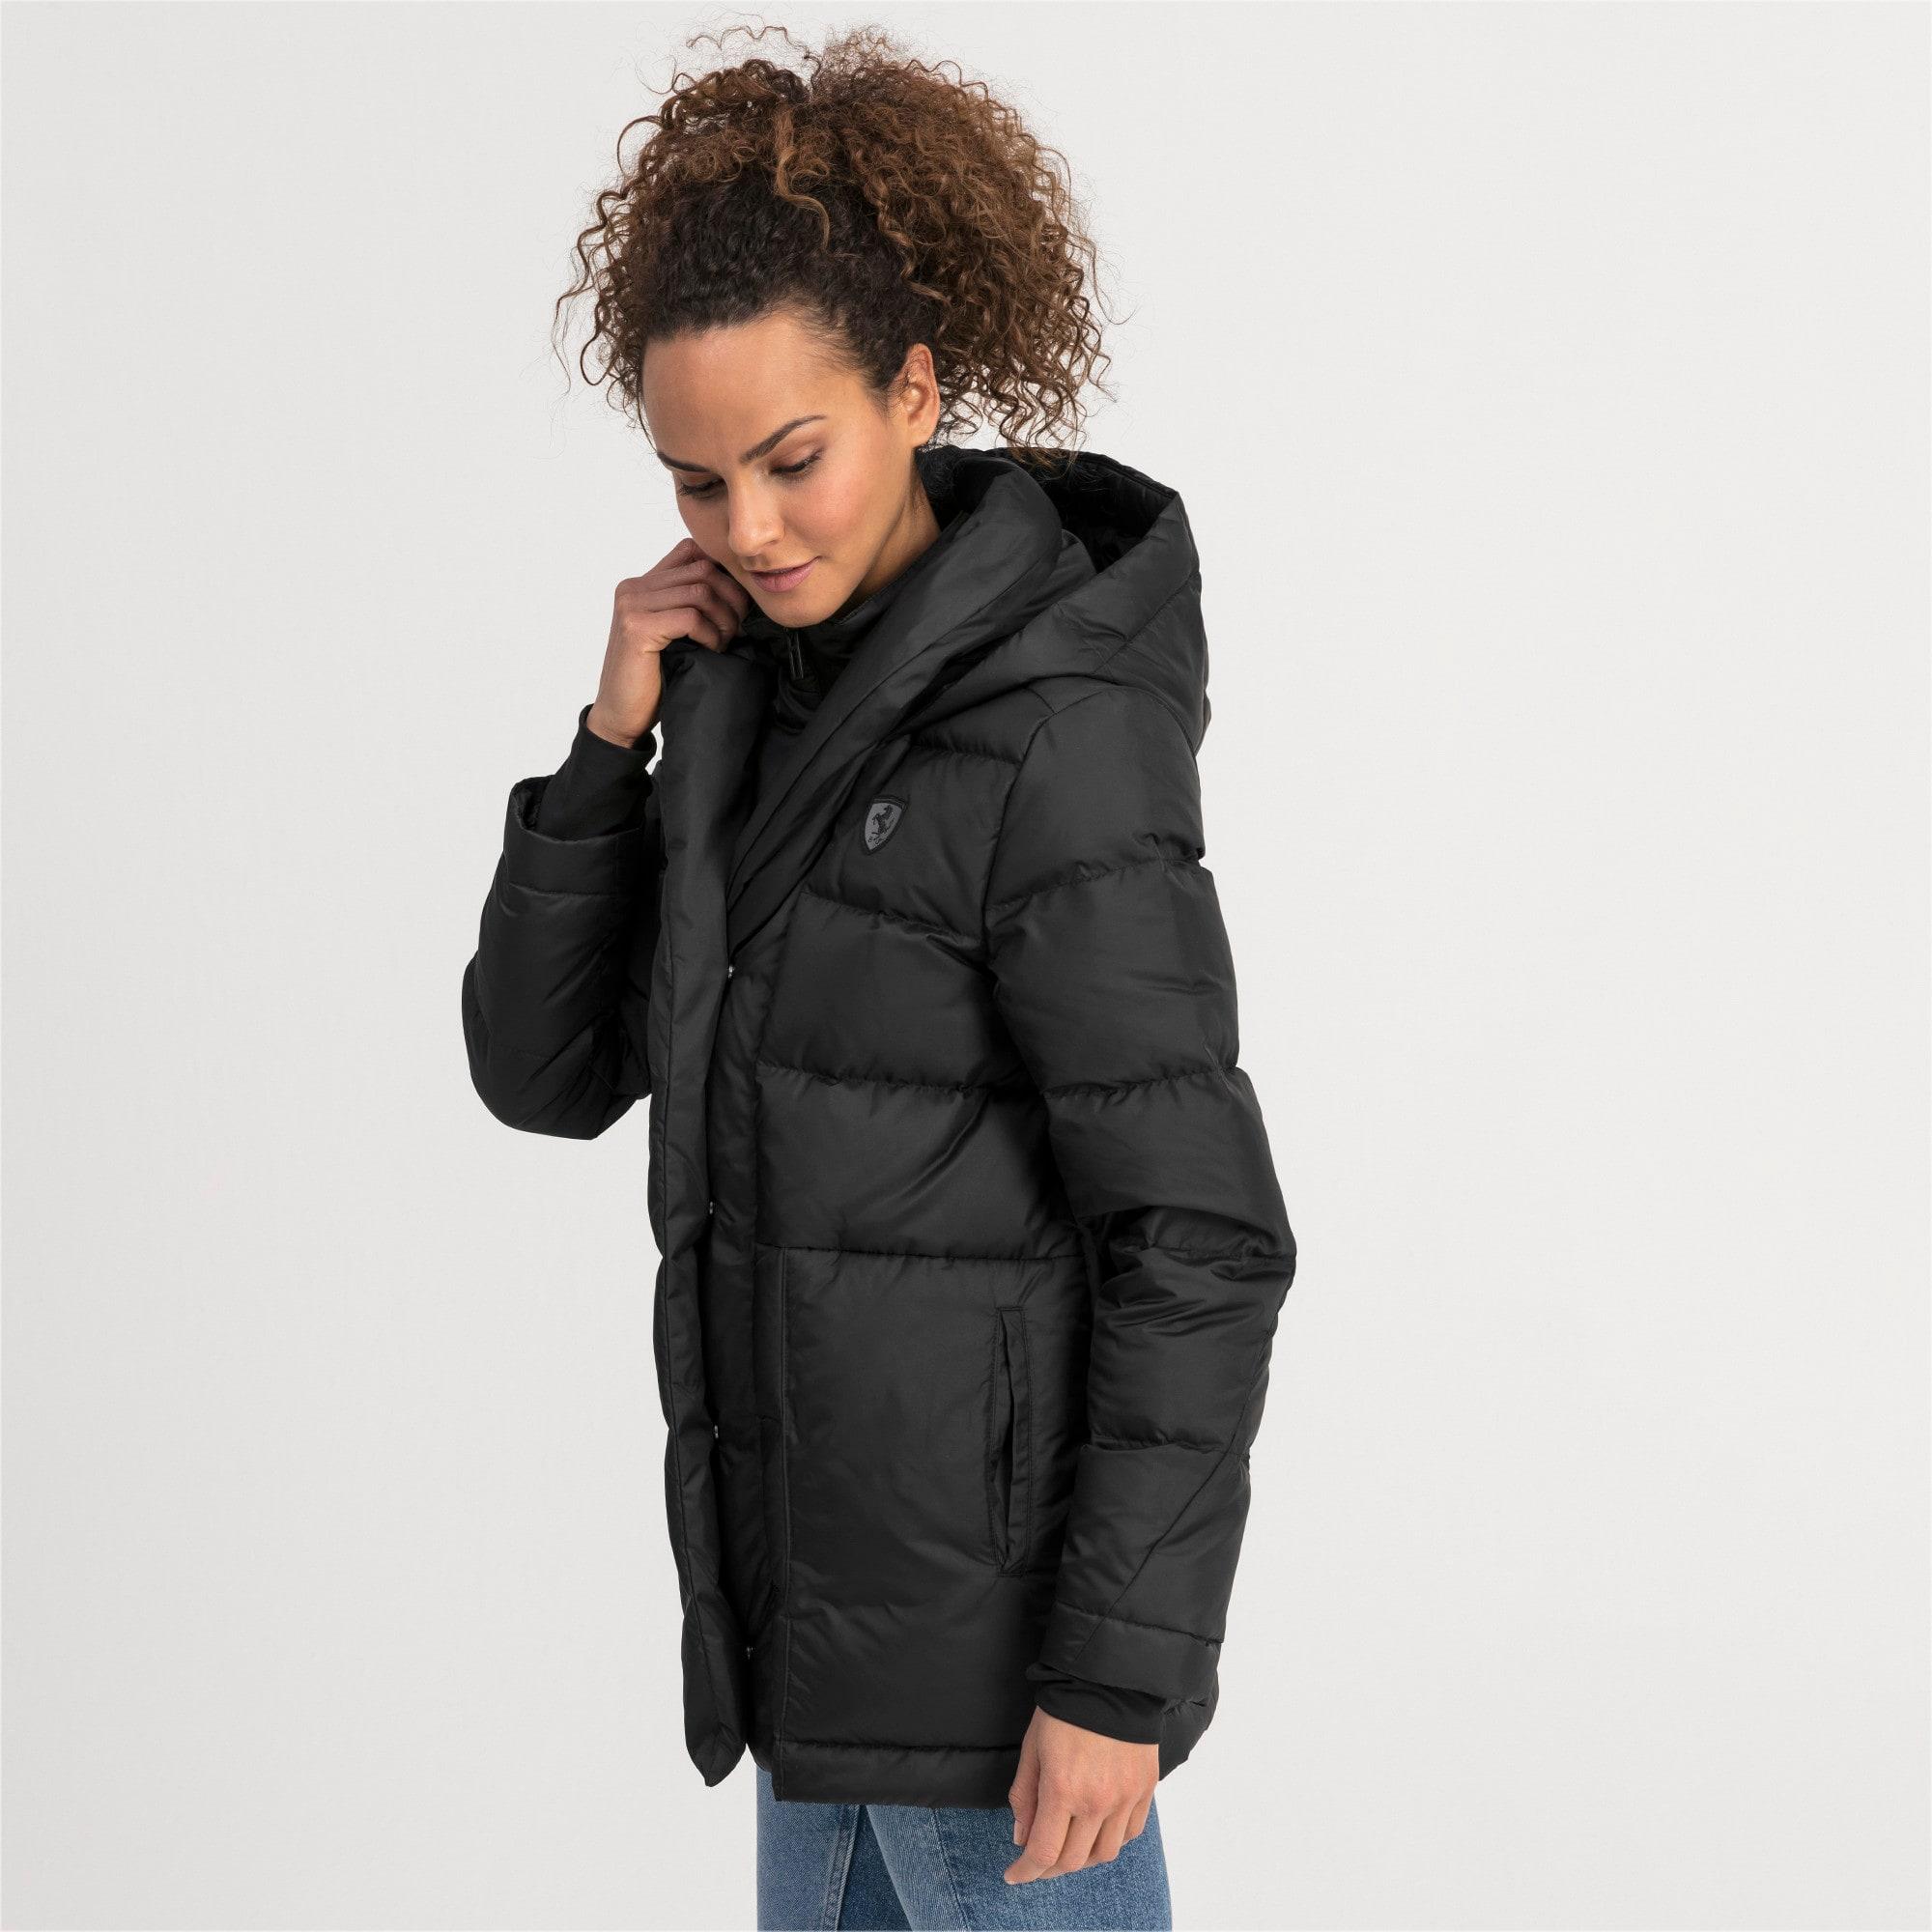 Thumbnail 1 of Ferrari Down Women's Jacket, Puma Black, medium